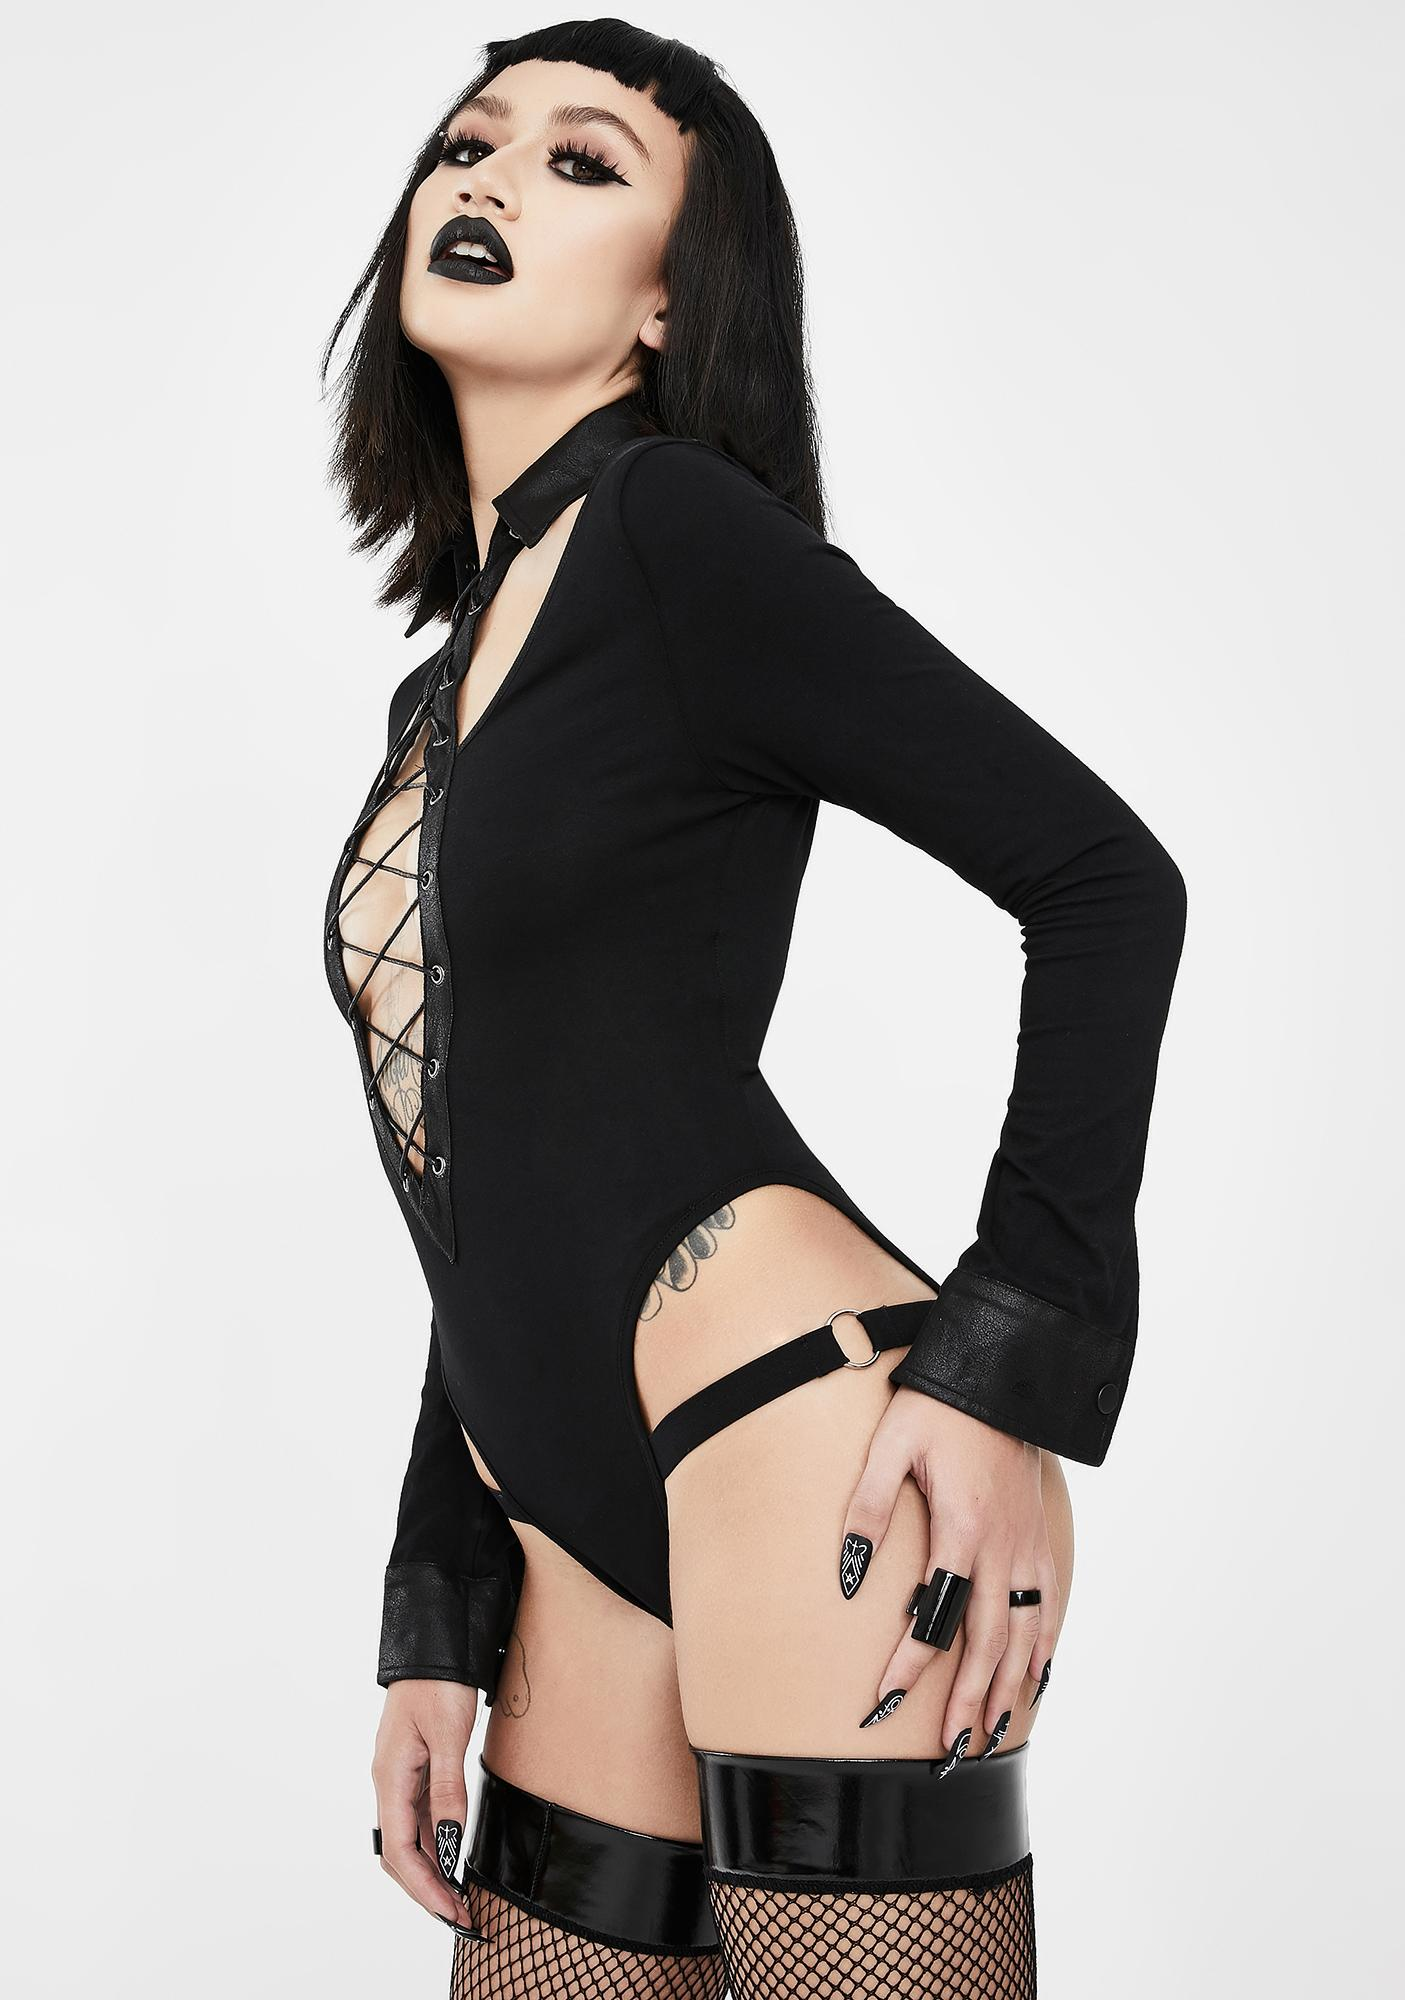 Devil Fashion Lace-Up Collared Bodysuit